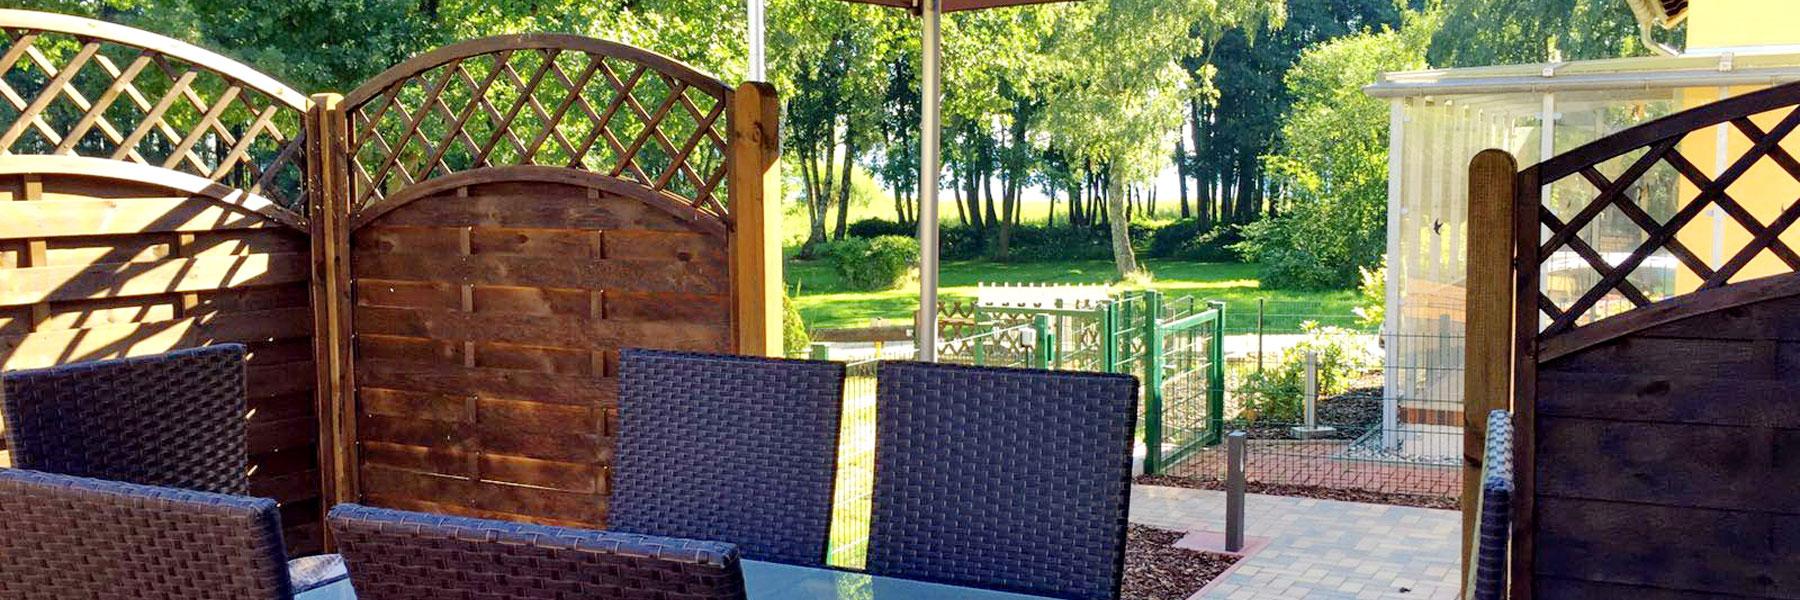 Terrasse - Ferienhaus Quetzina